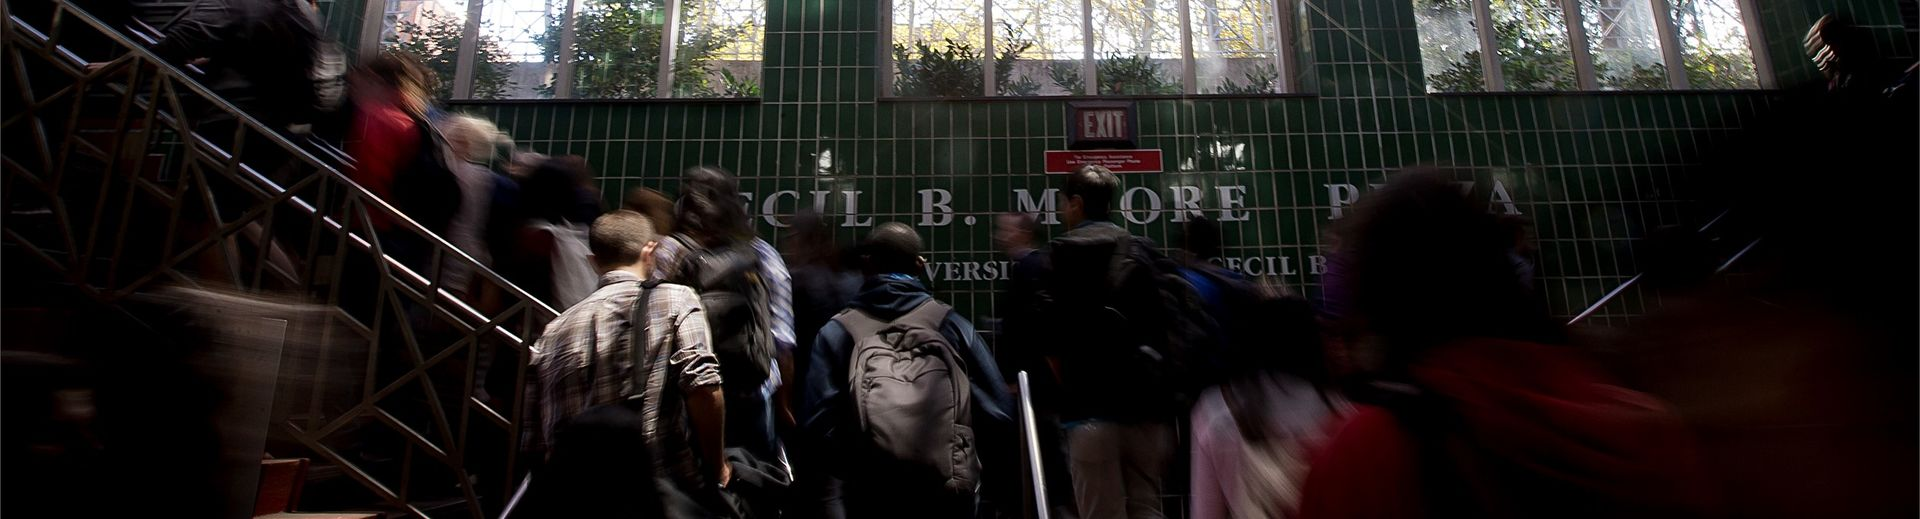 Subway Entrance on Campus